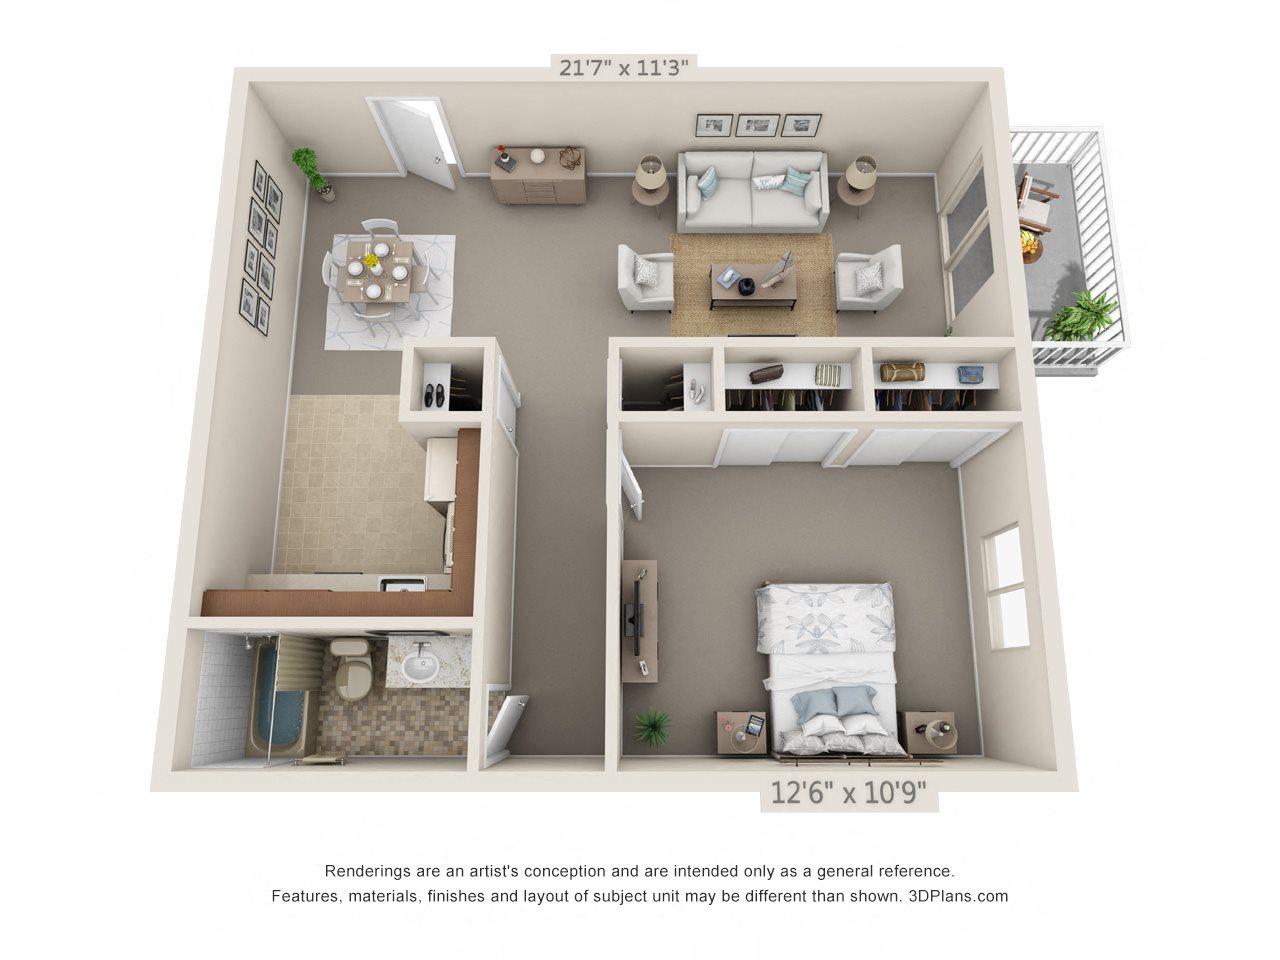 1 Bedroom, 1 Bath (Balcony, Heat Paid) Floor Plan 6